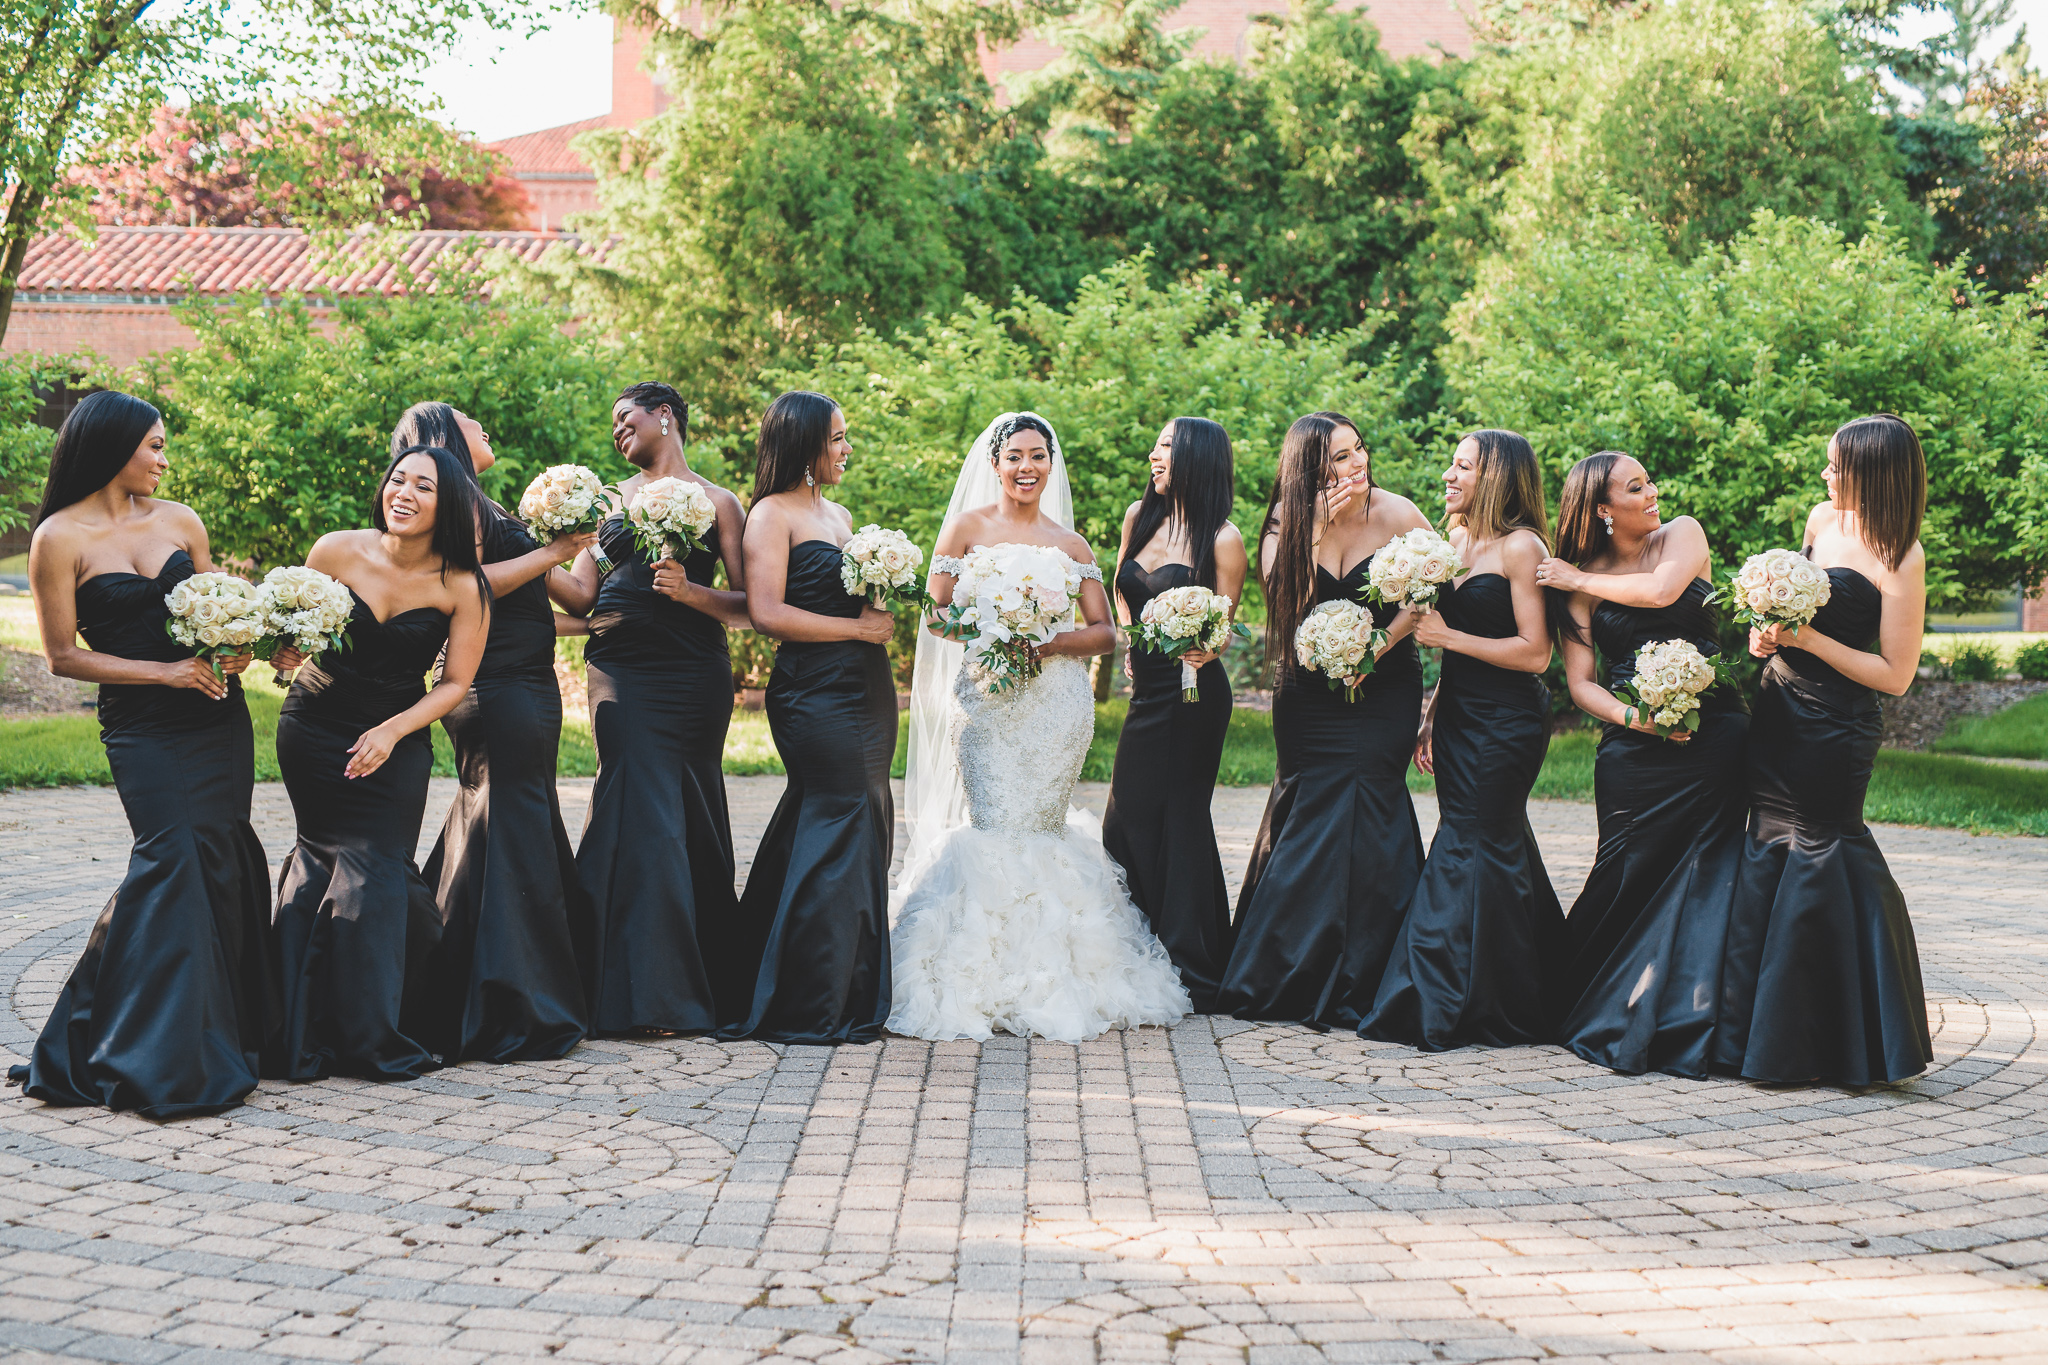 20180527wedding-gant-592.jpg